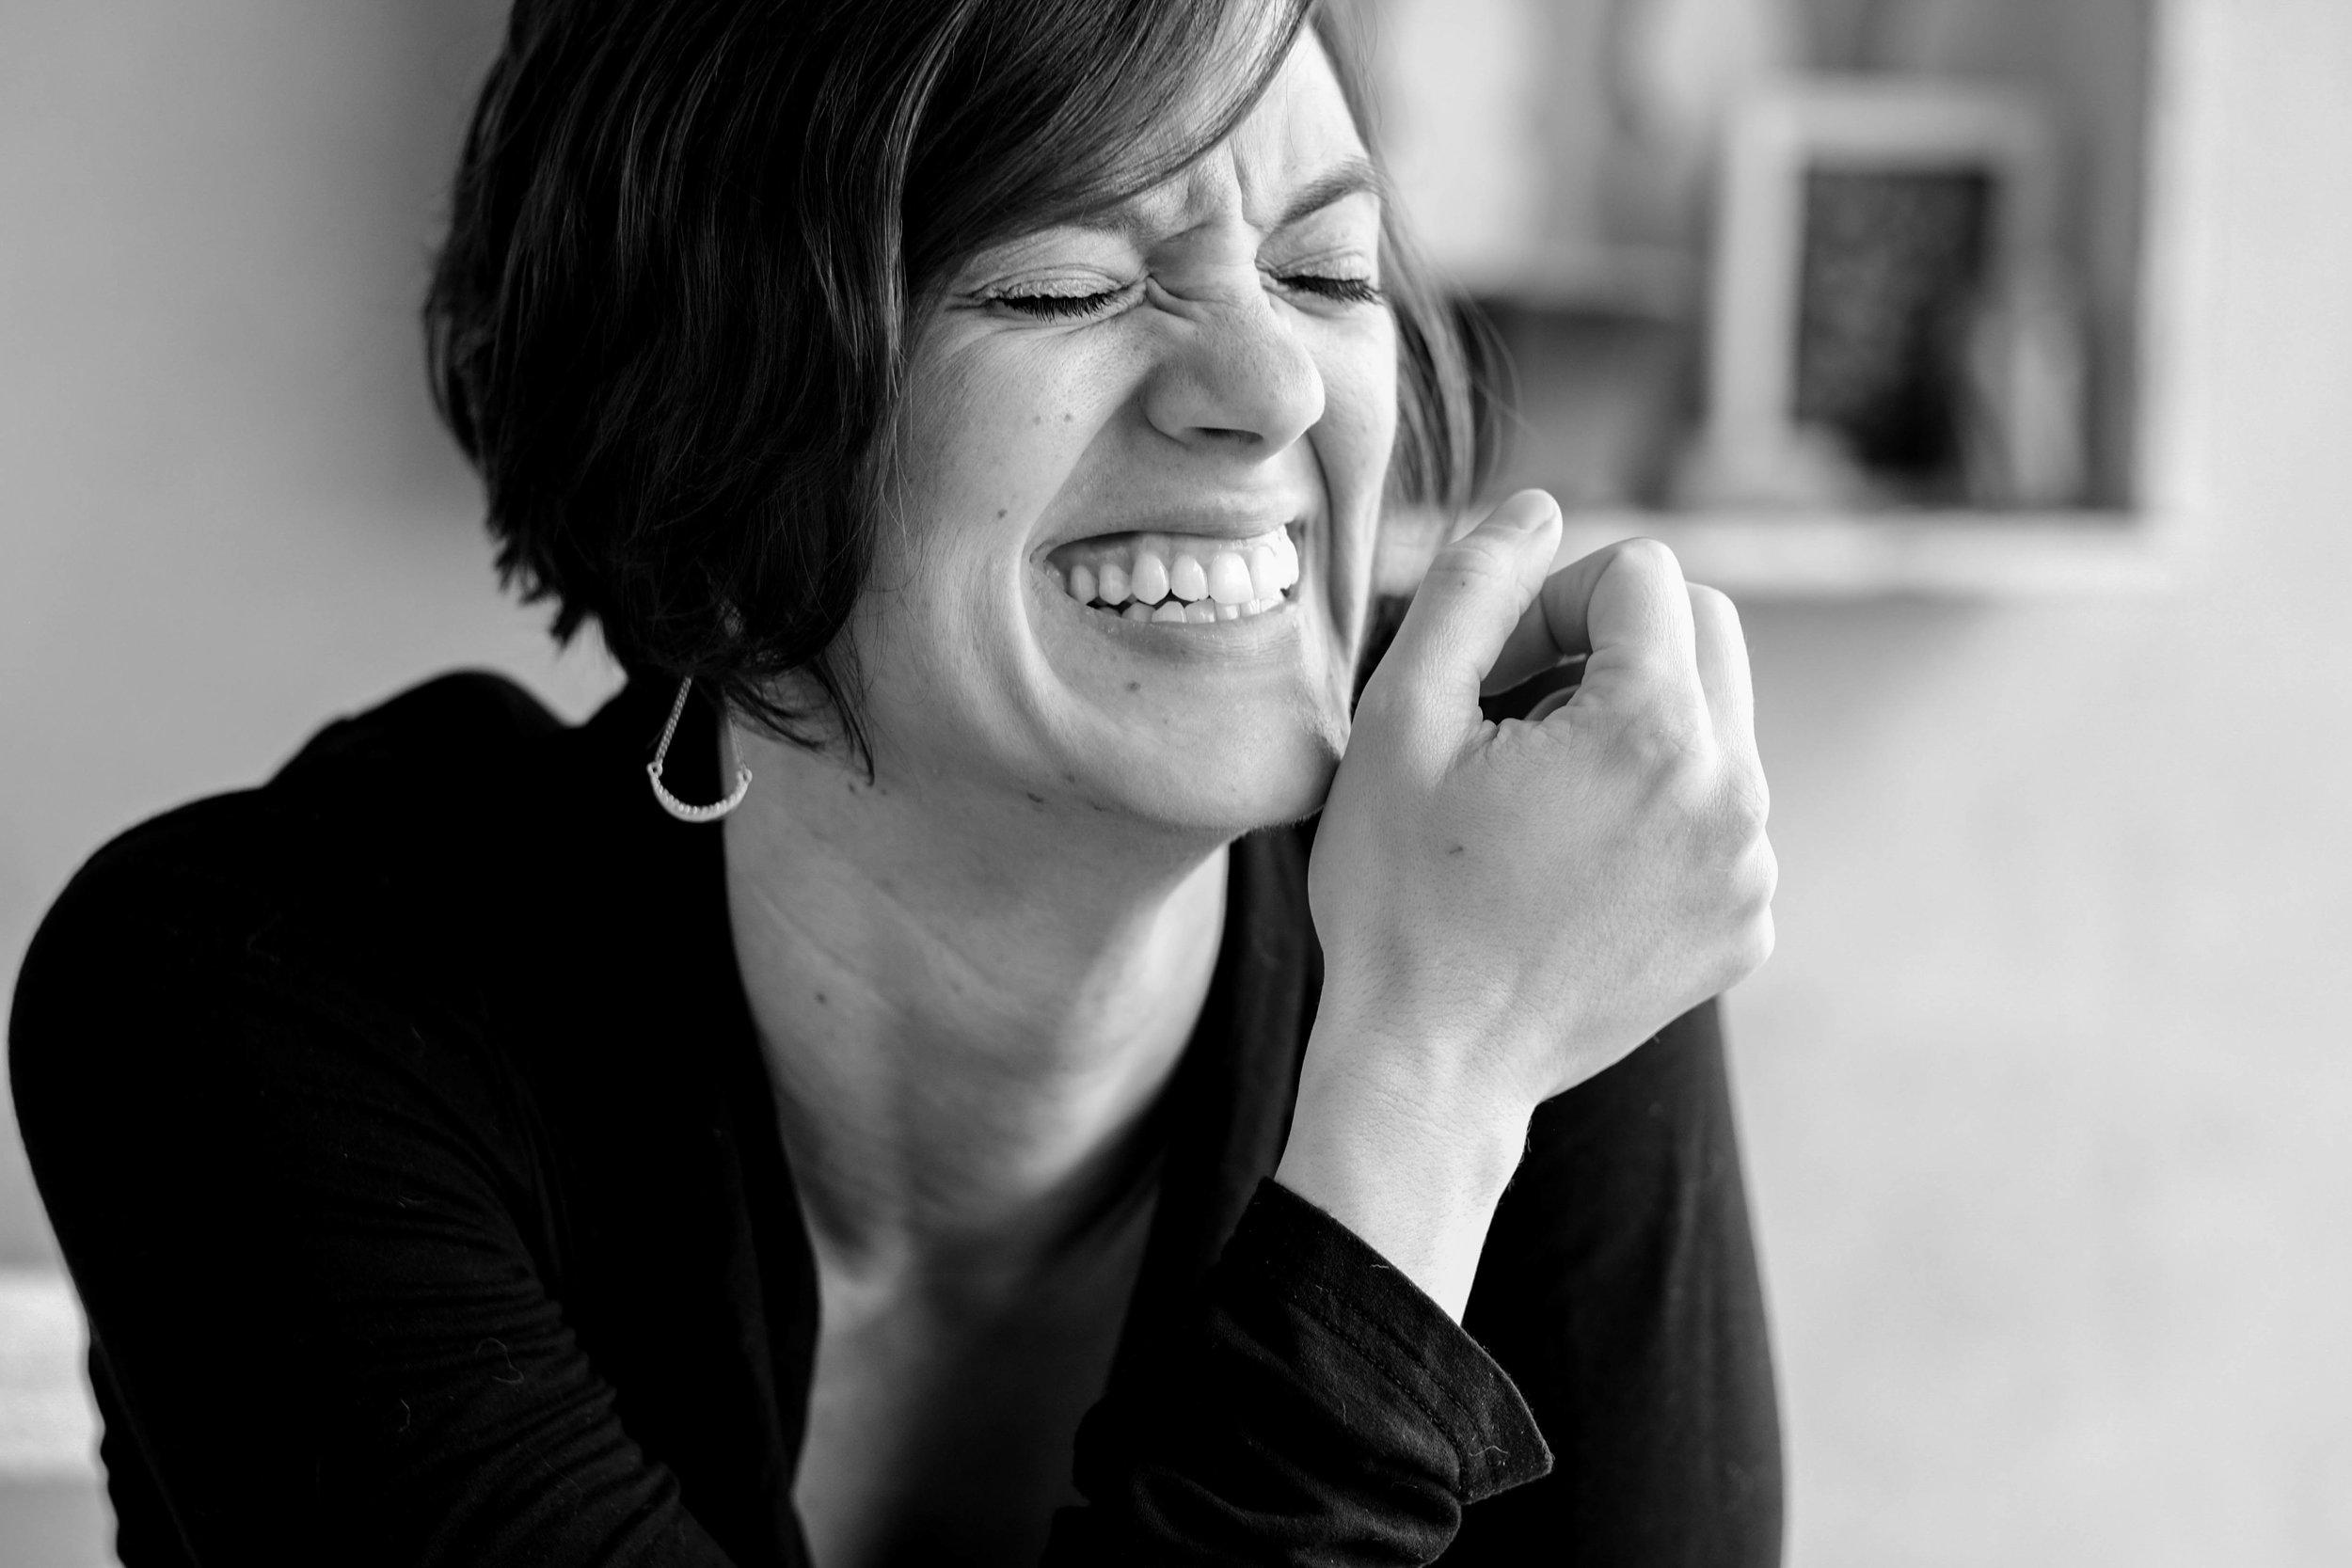 portrait black and white Seattle laugh woman